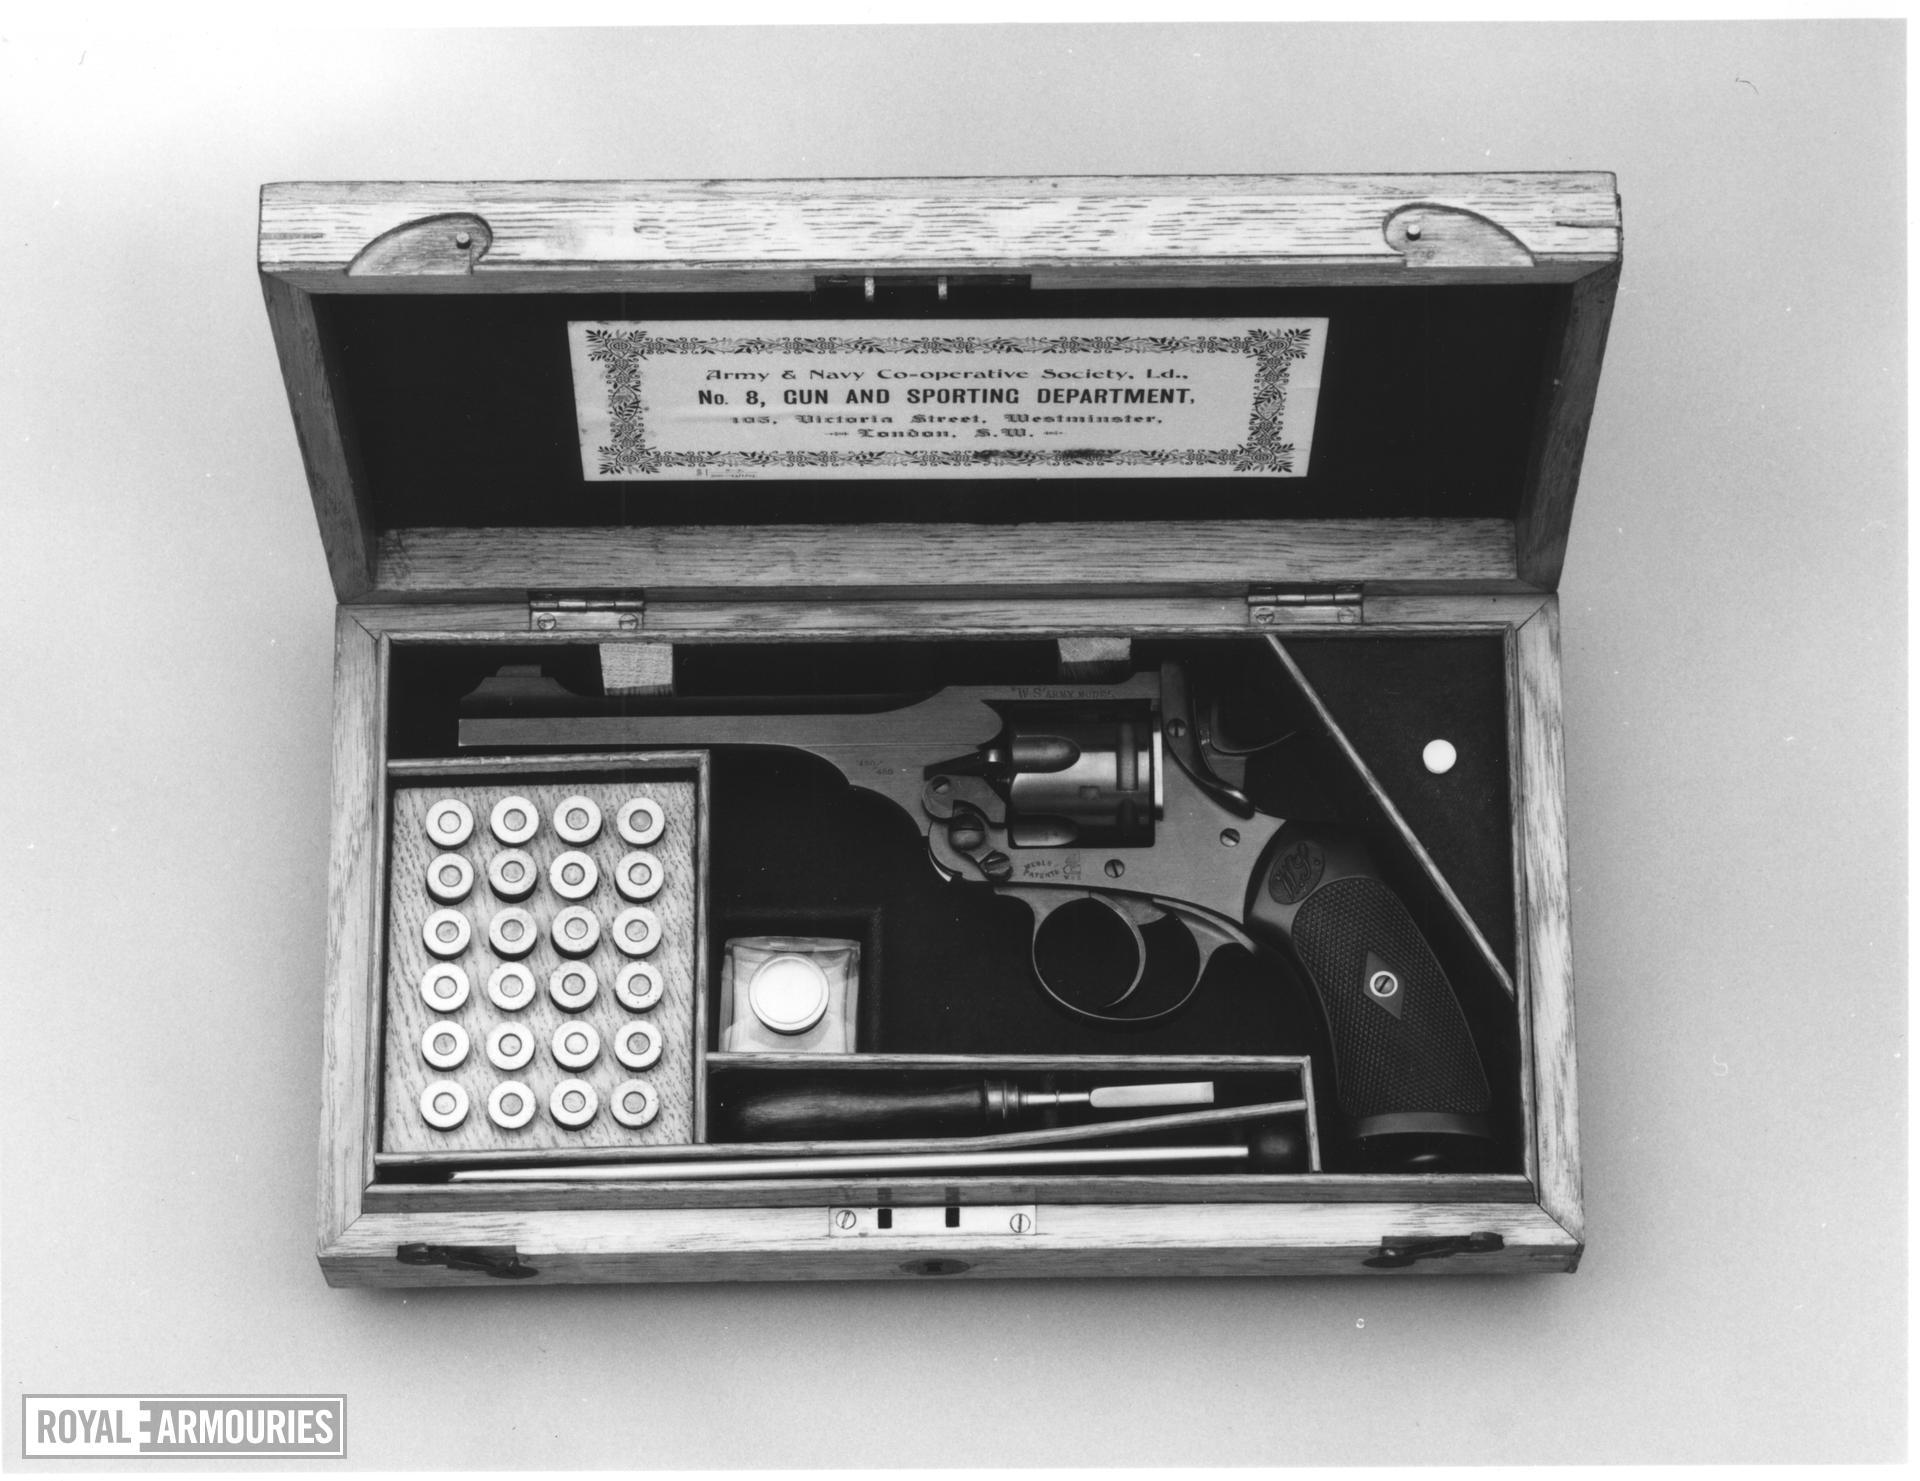 Centrefire six-shot revolver - Webley Model 1904